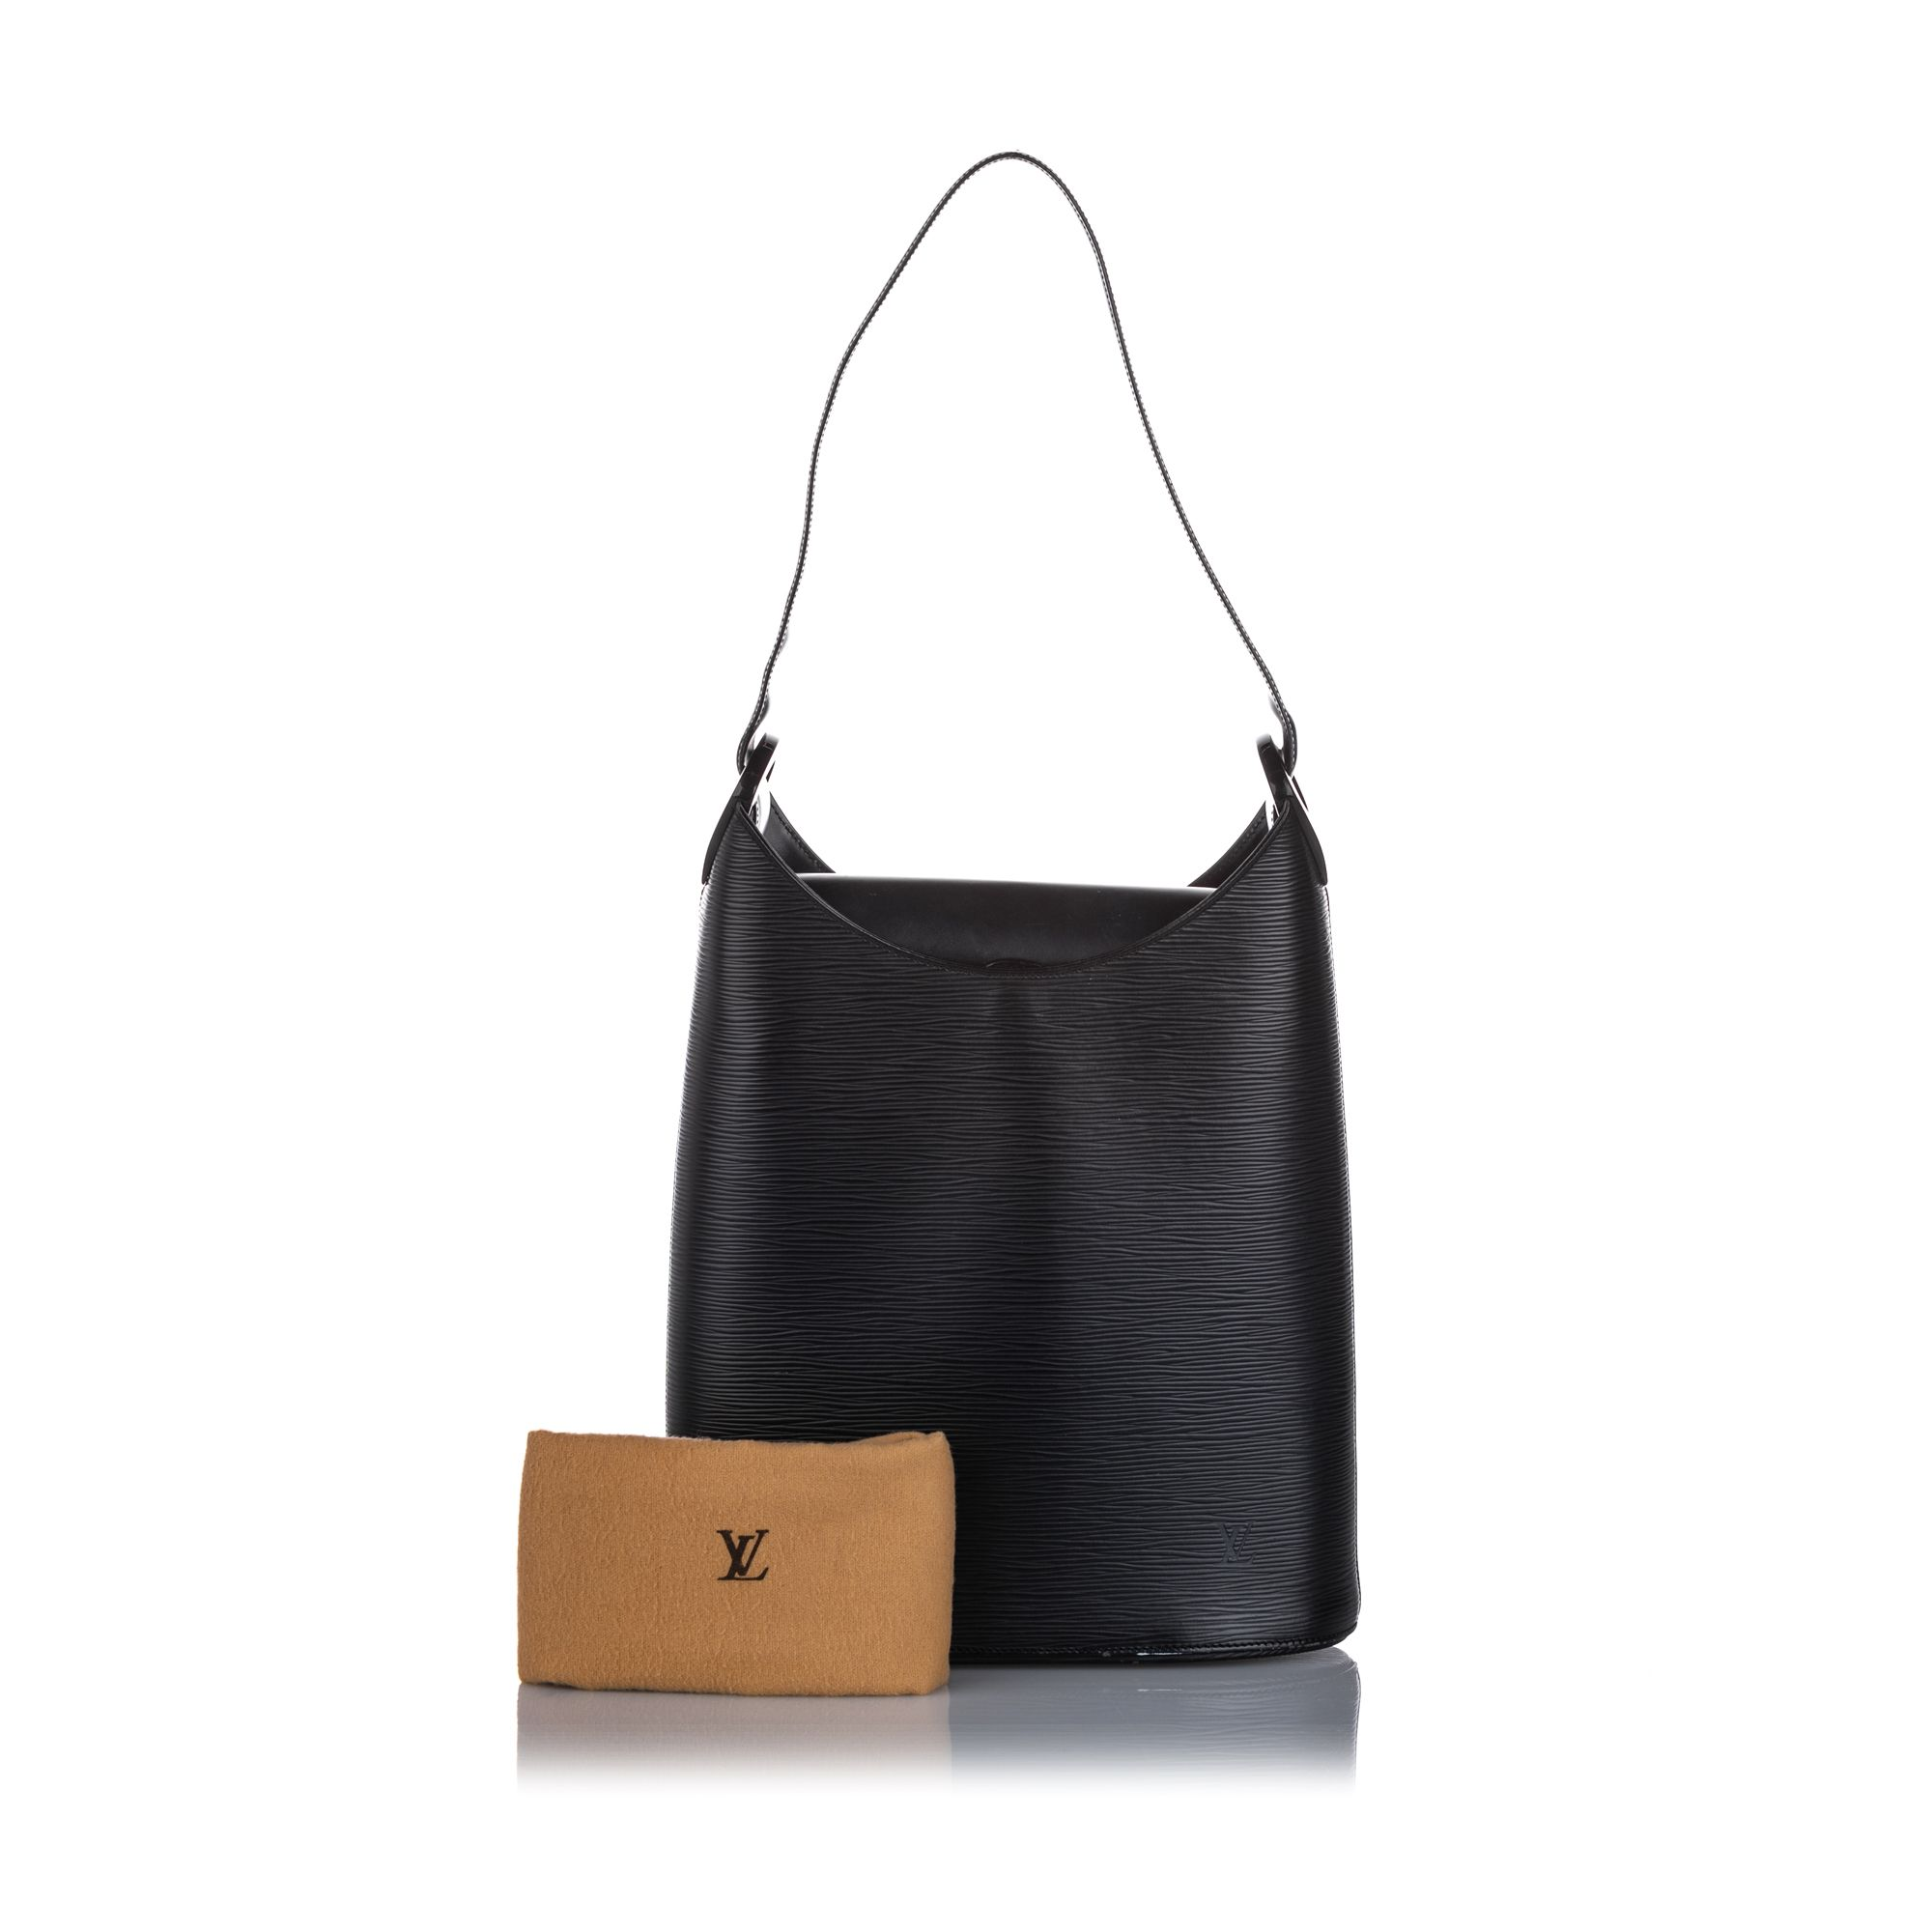 Vintage Louis Vuitton Epi Sac Verseau Black